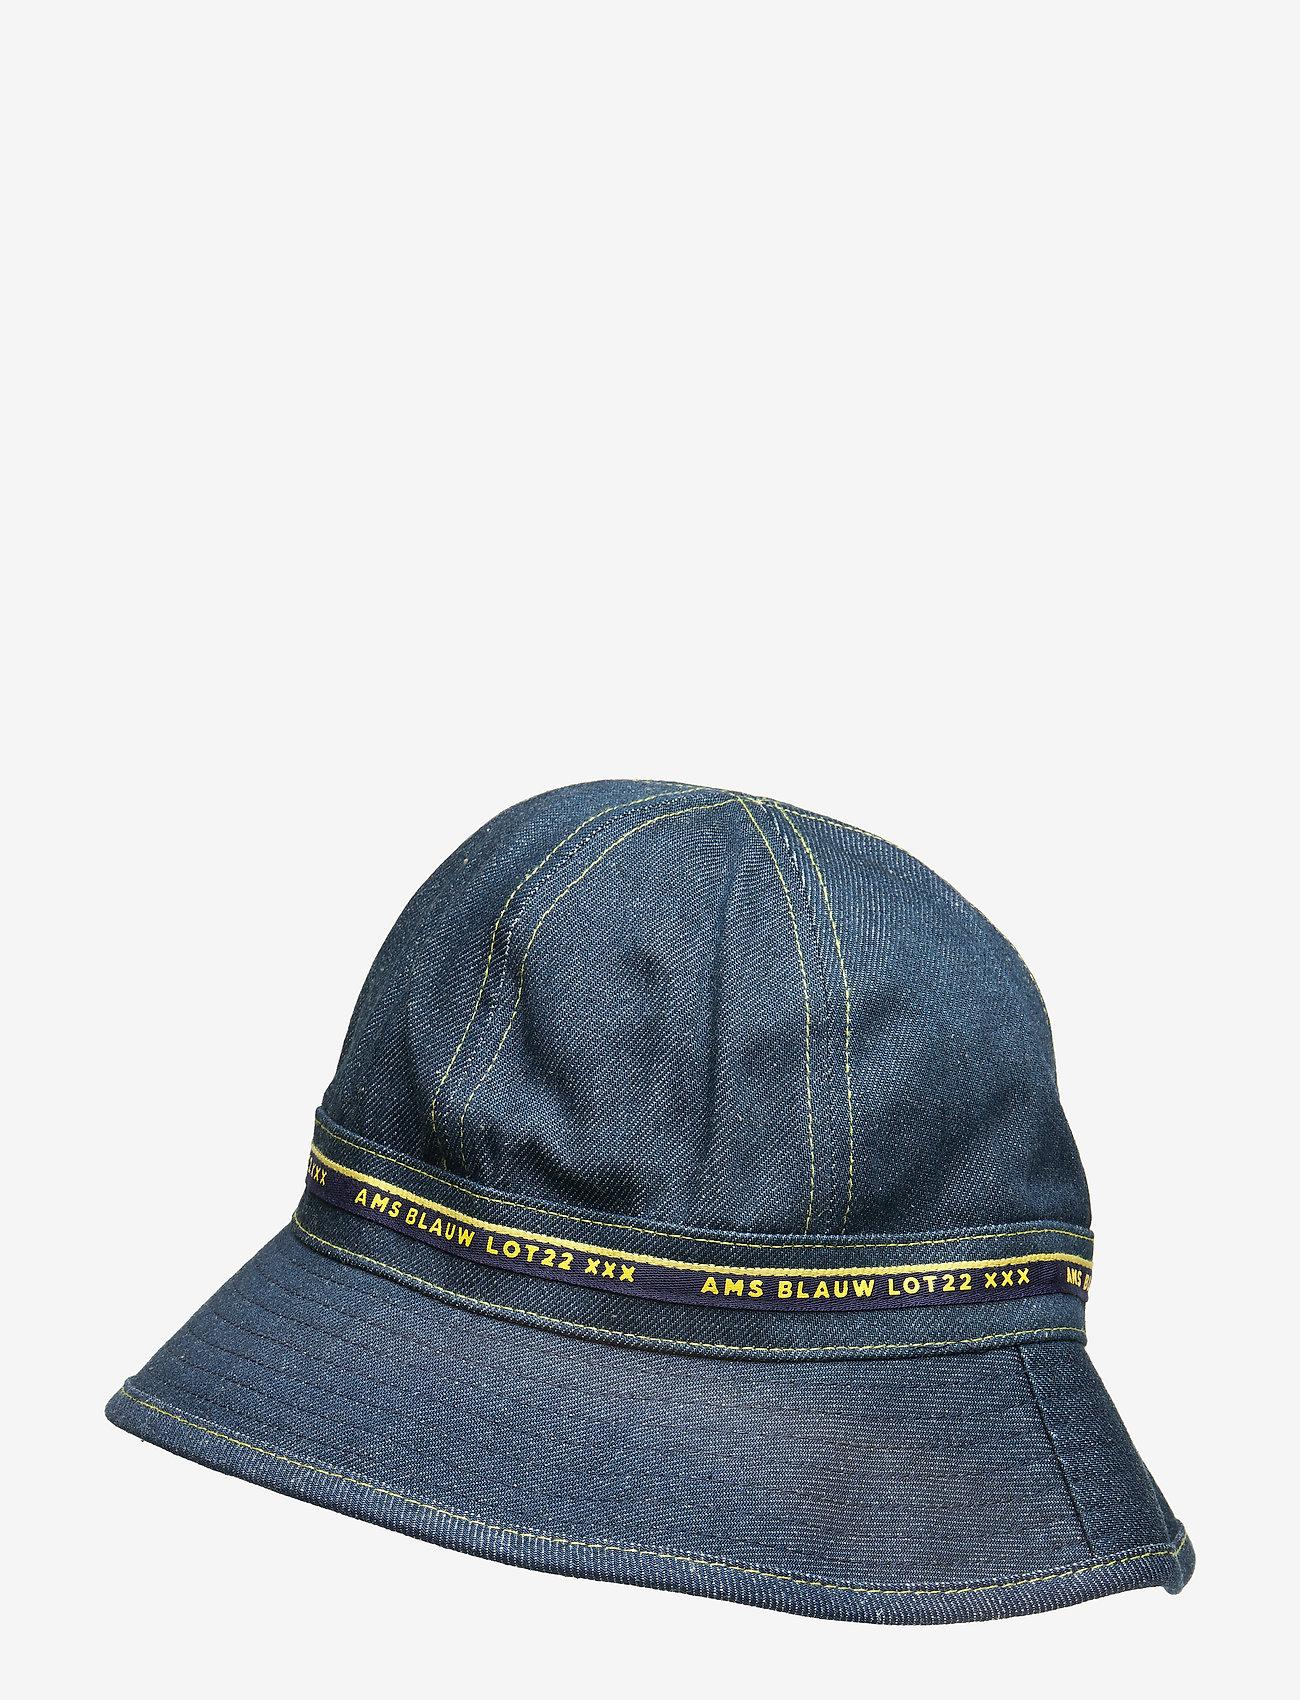 Scotch & Soda - Lot 22 bucket hat - bucket hats - indigo - 1